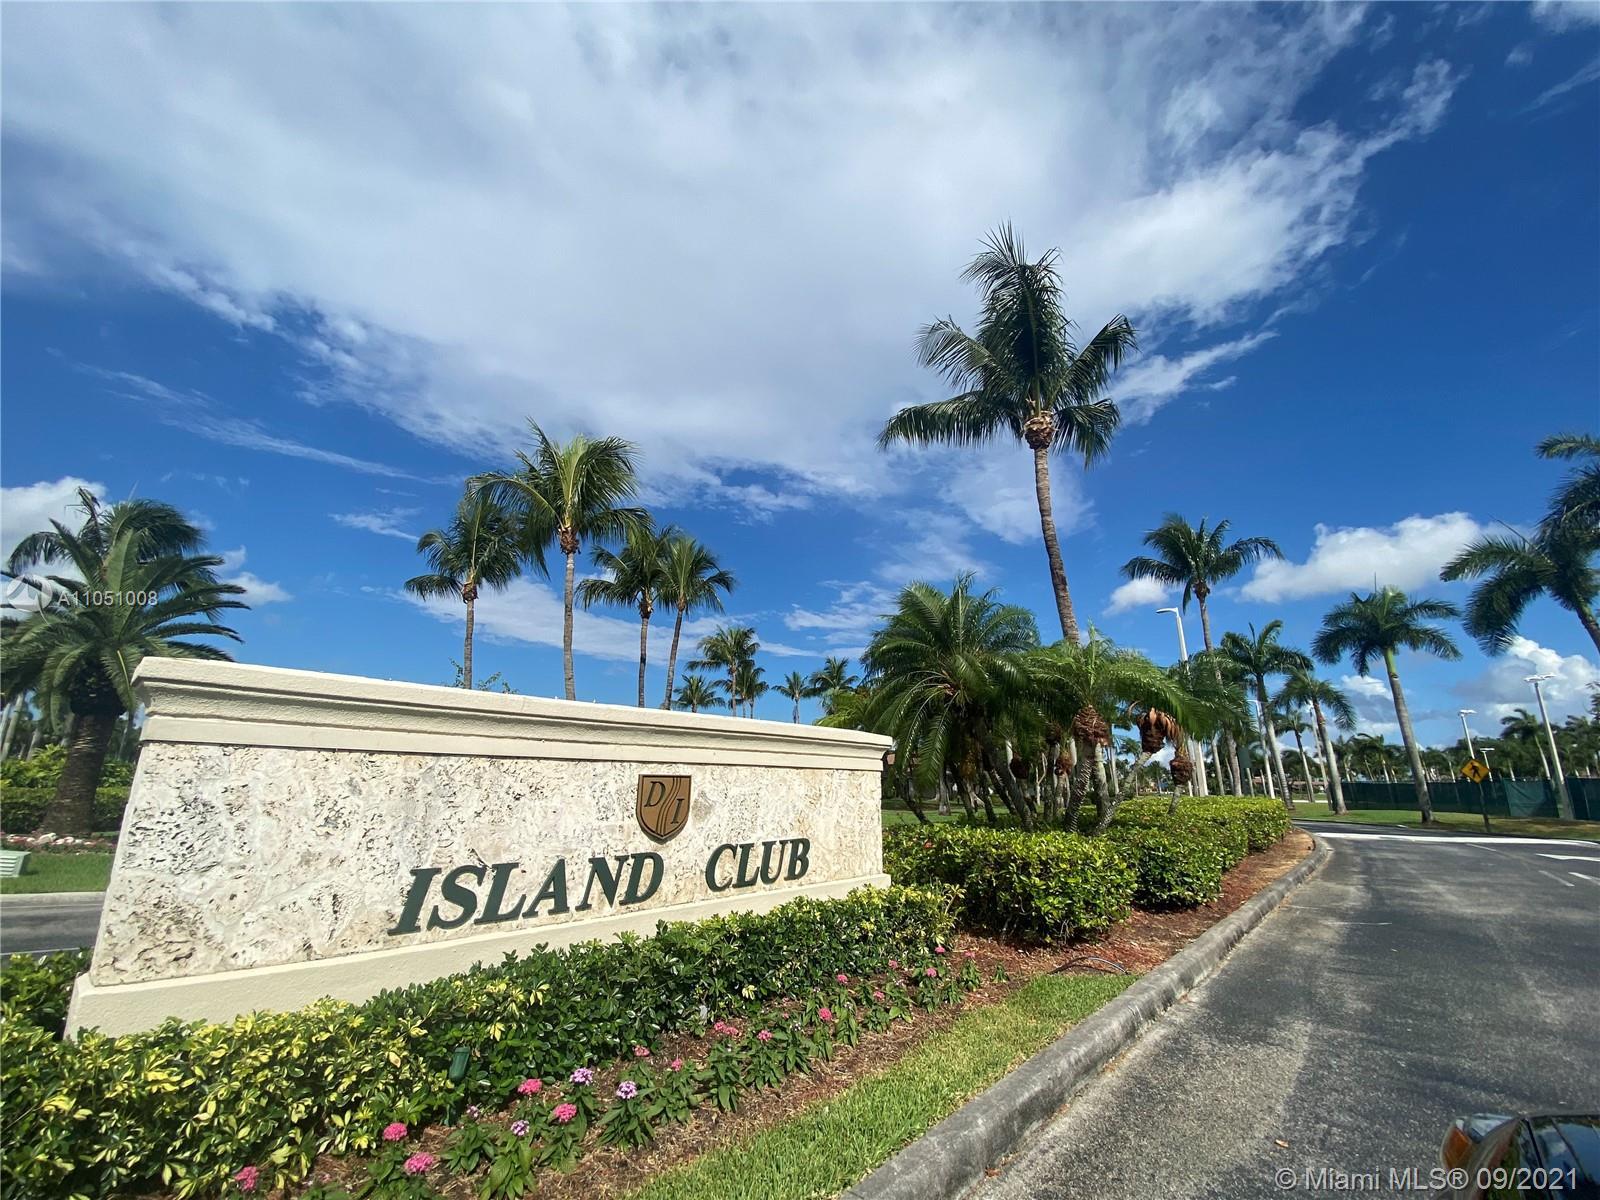 Doral Isles - 10888 NW 58th Ter, Doral, FL 33178